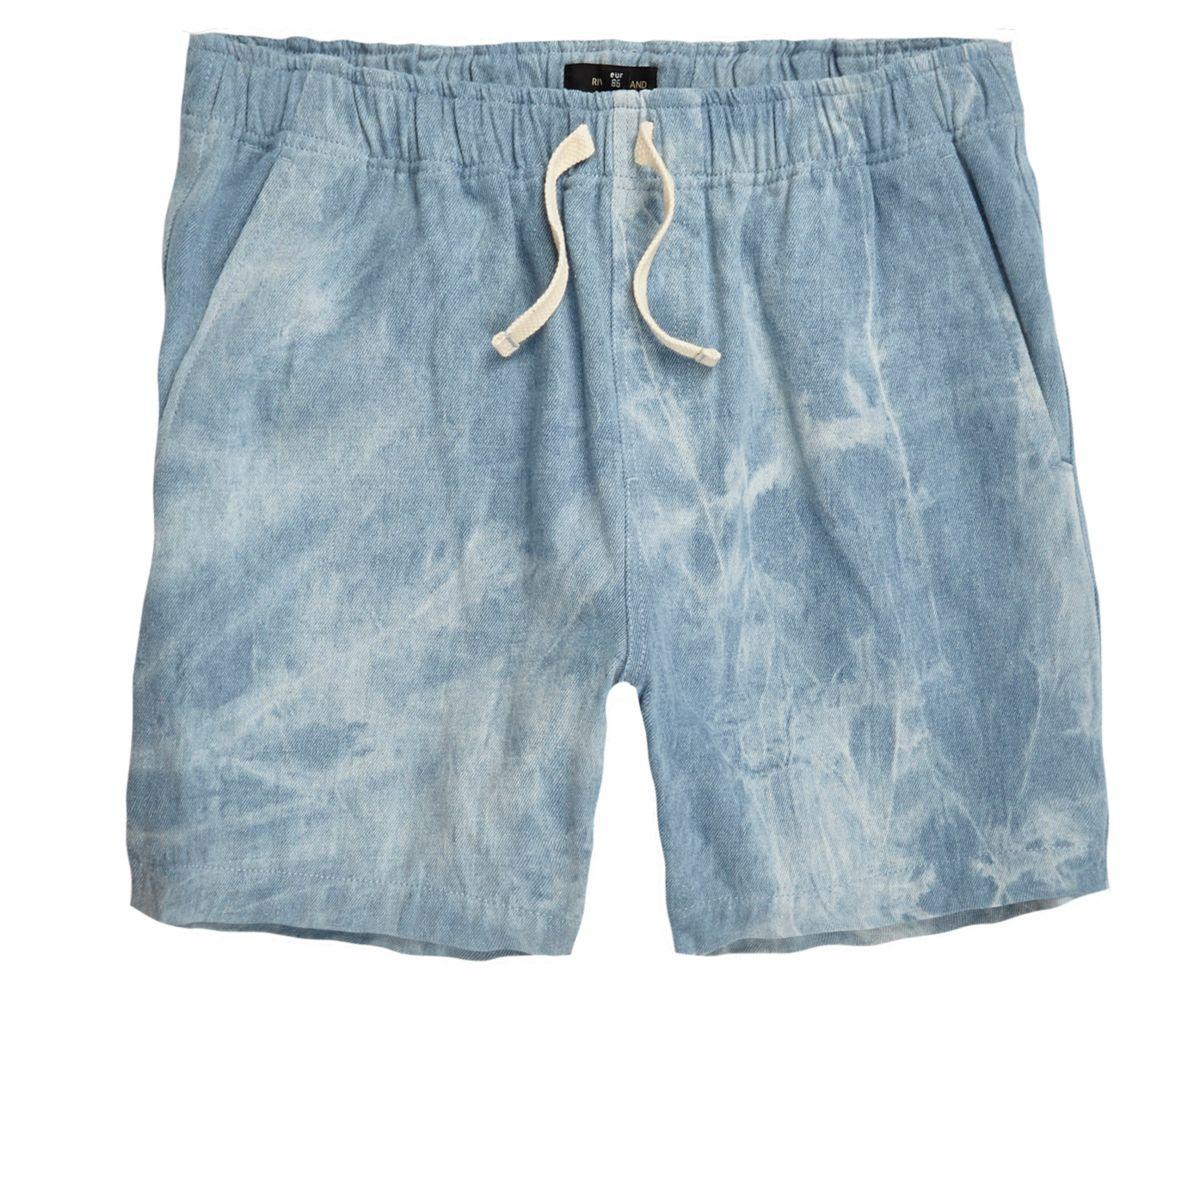 Blaue Shorts in Acid-Waschung